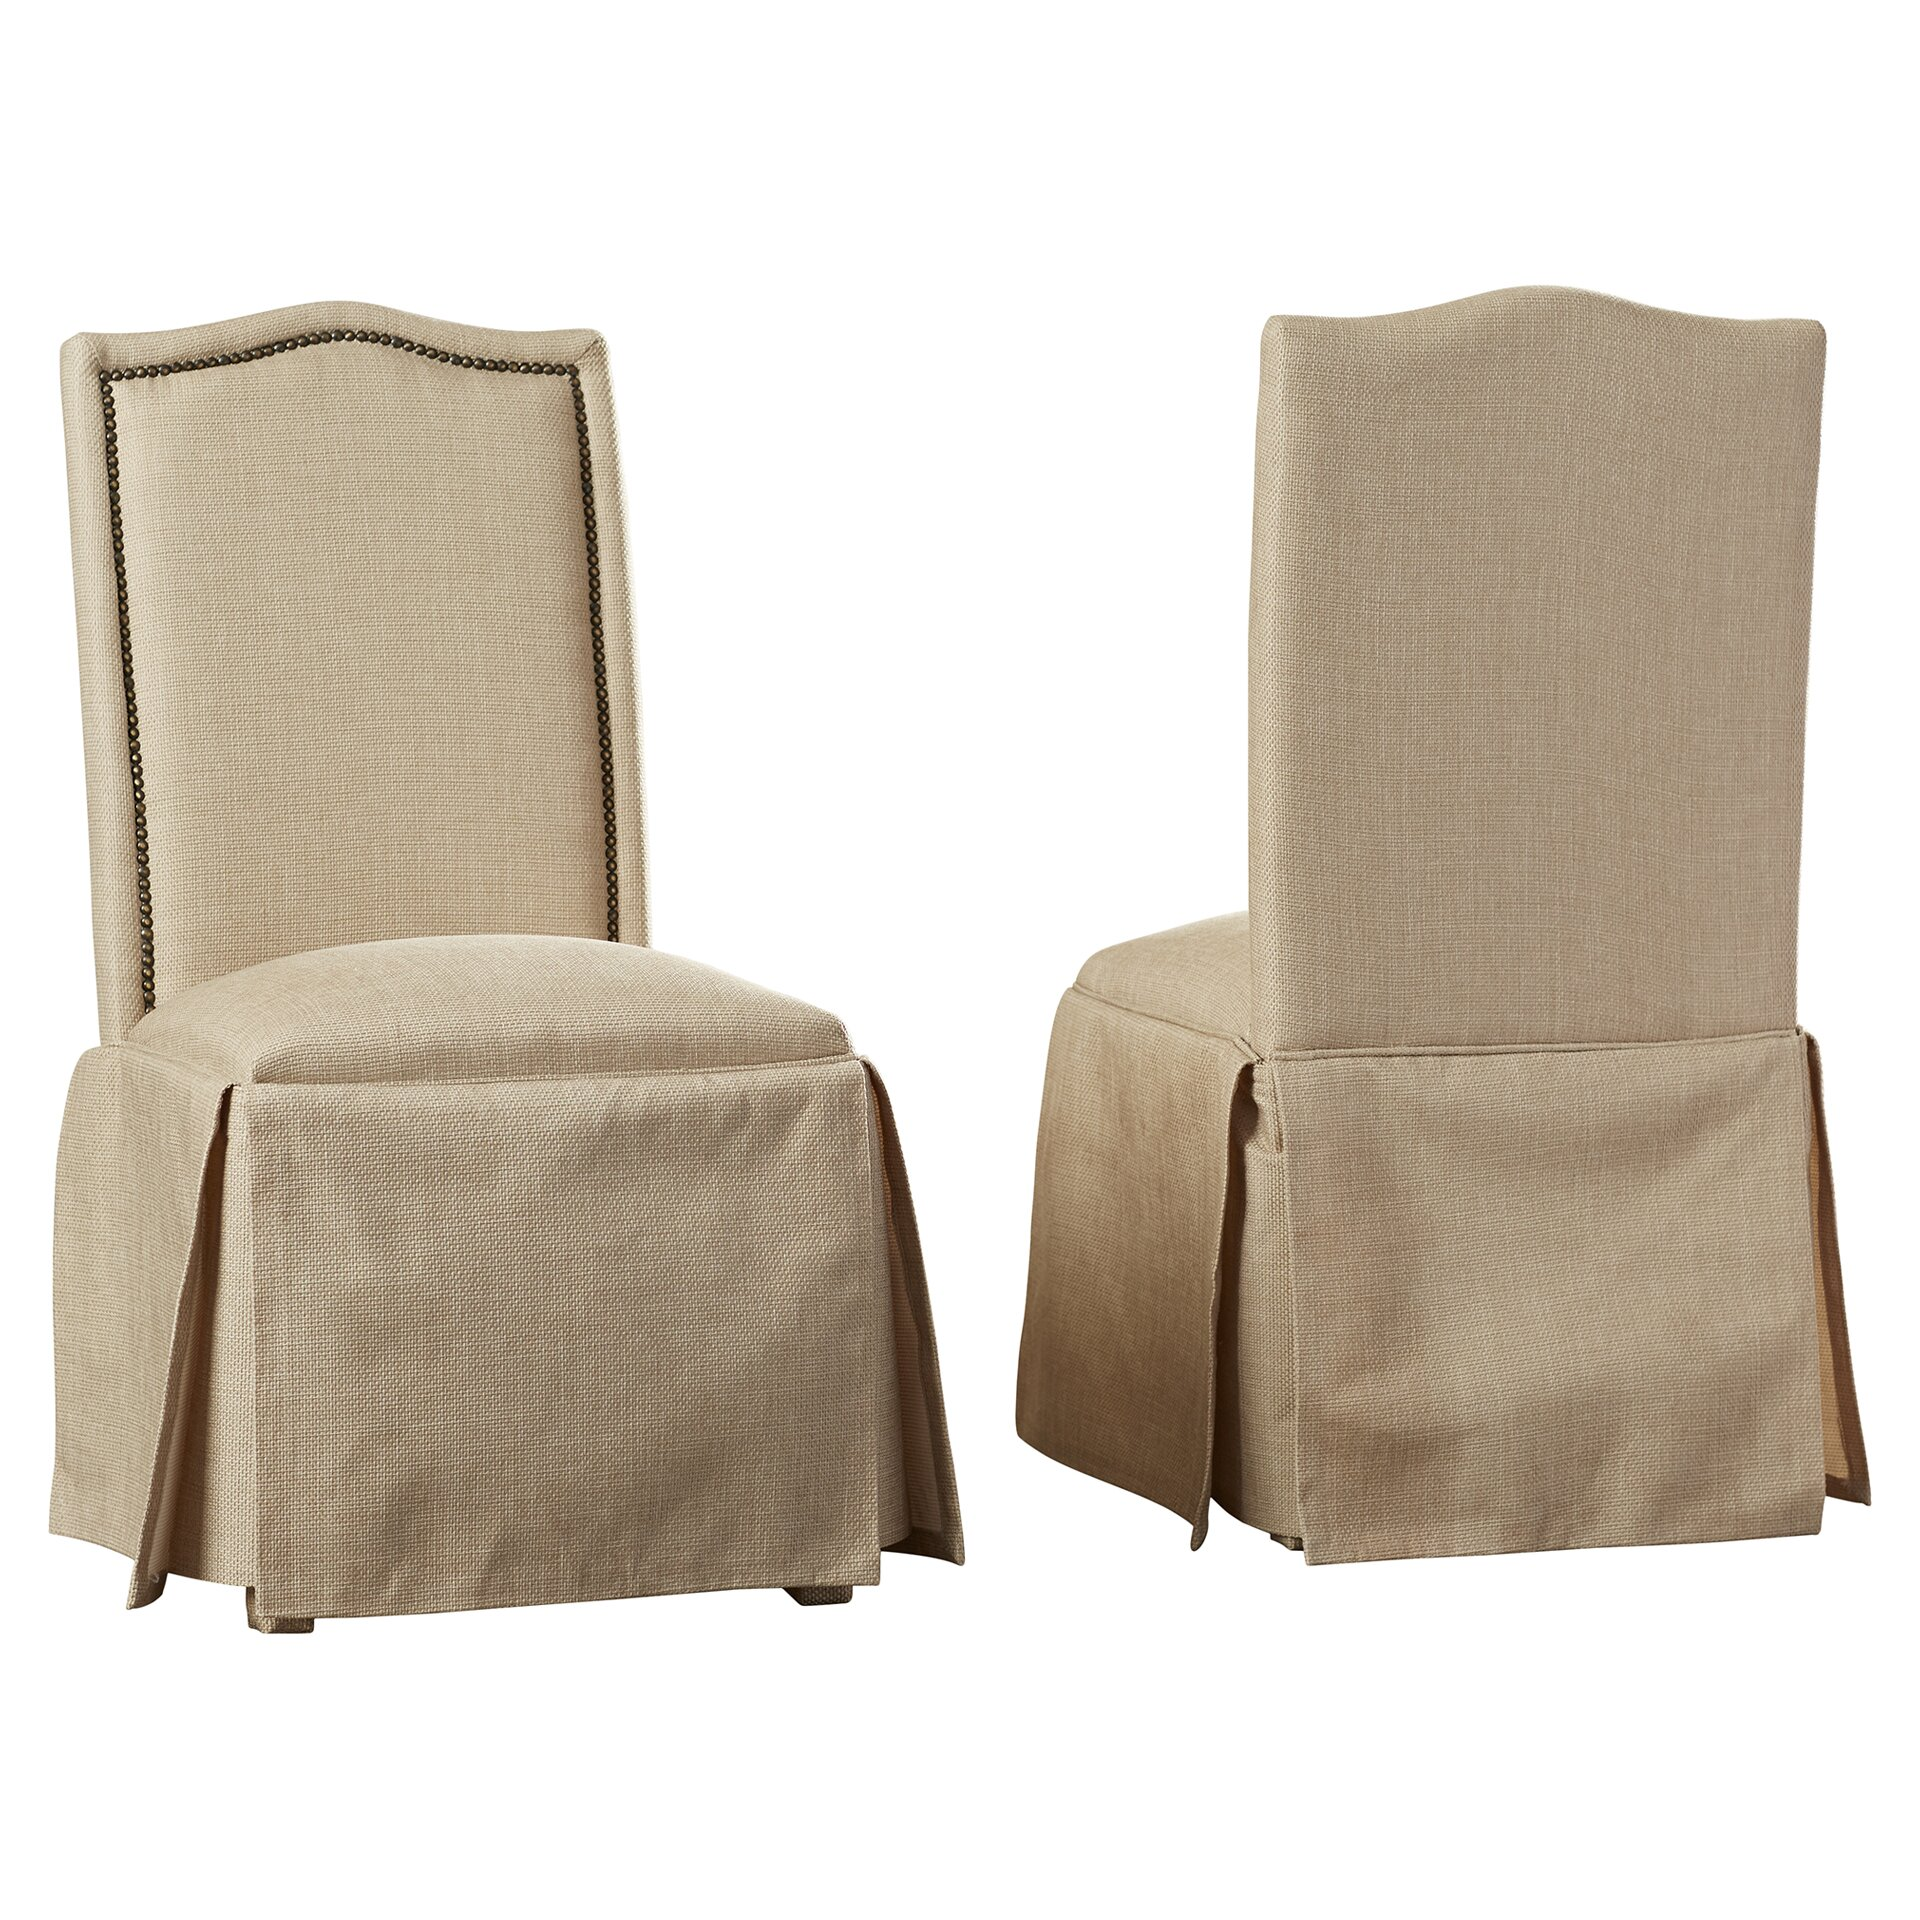 charlton home archie skirted parsons chair reviews wayfair